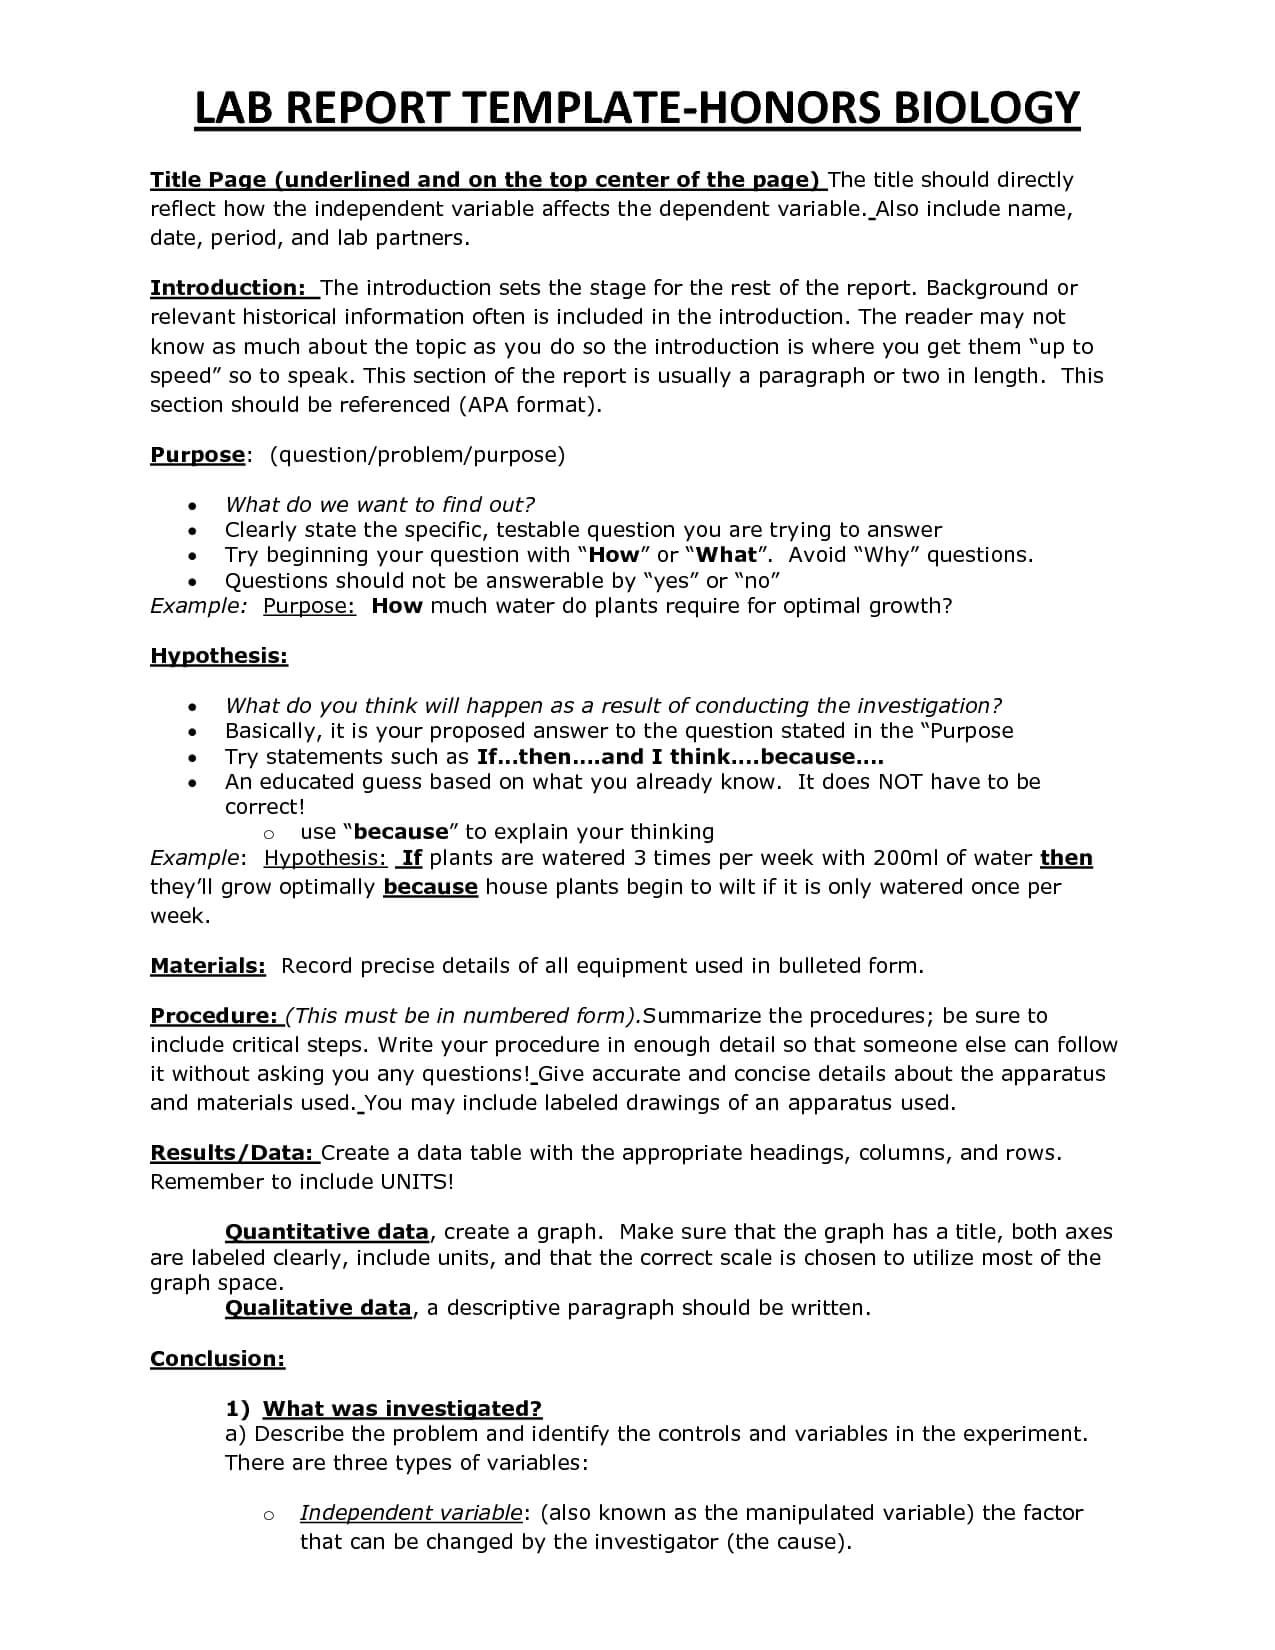 Chs Hbio Lab Report Template | Biology | Lab Report Template For Biology Lab Report Template